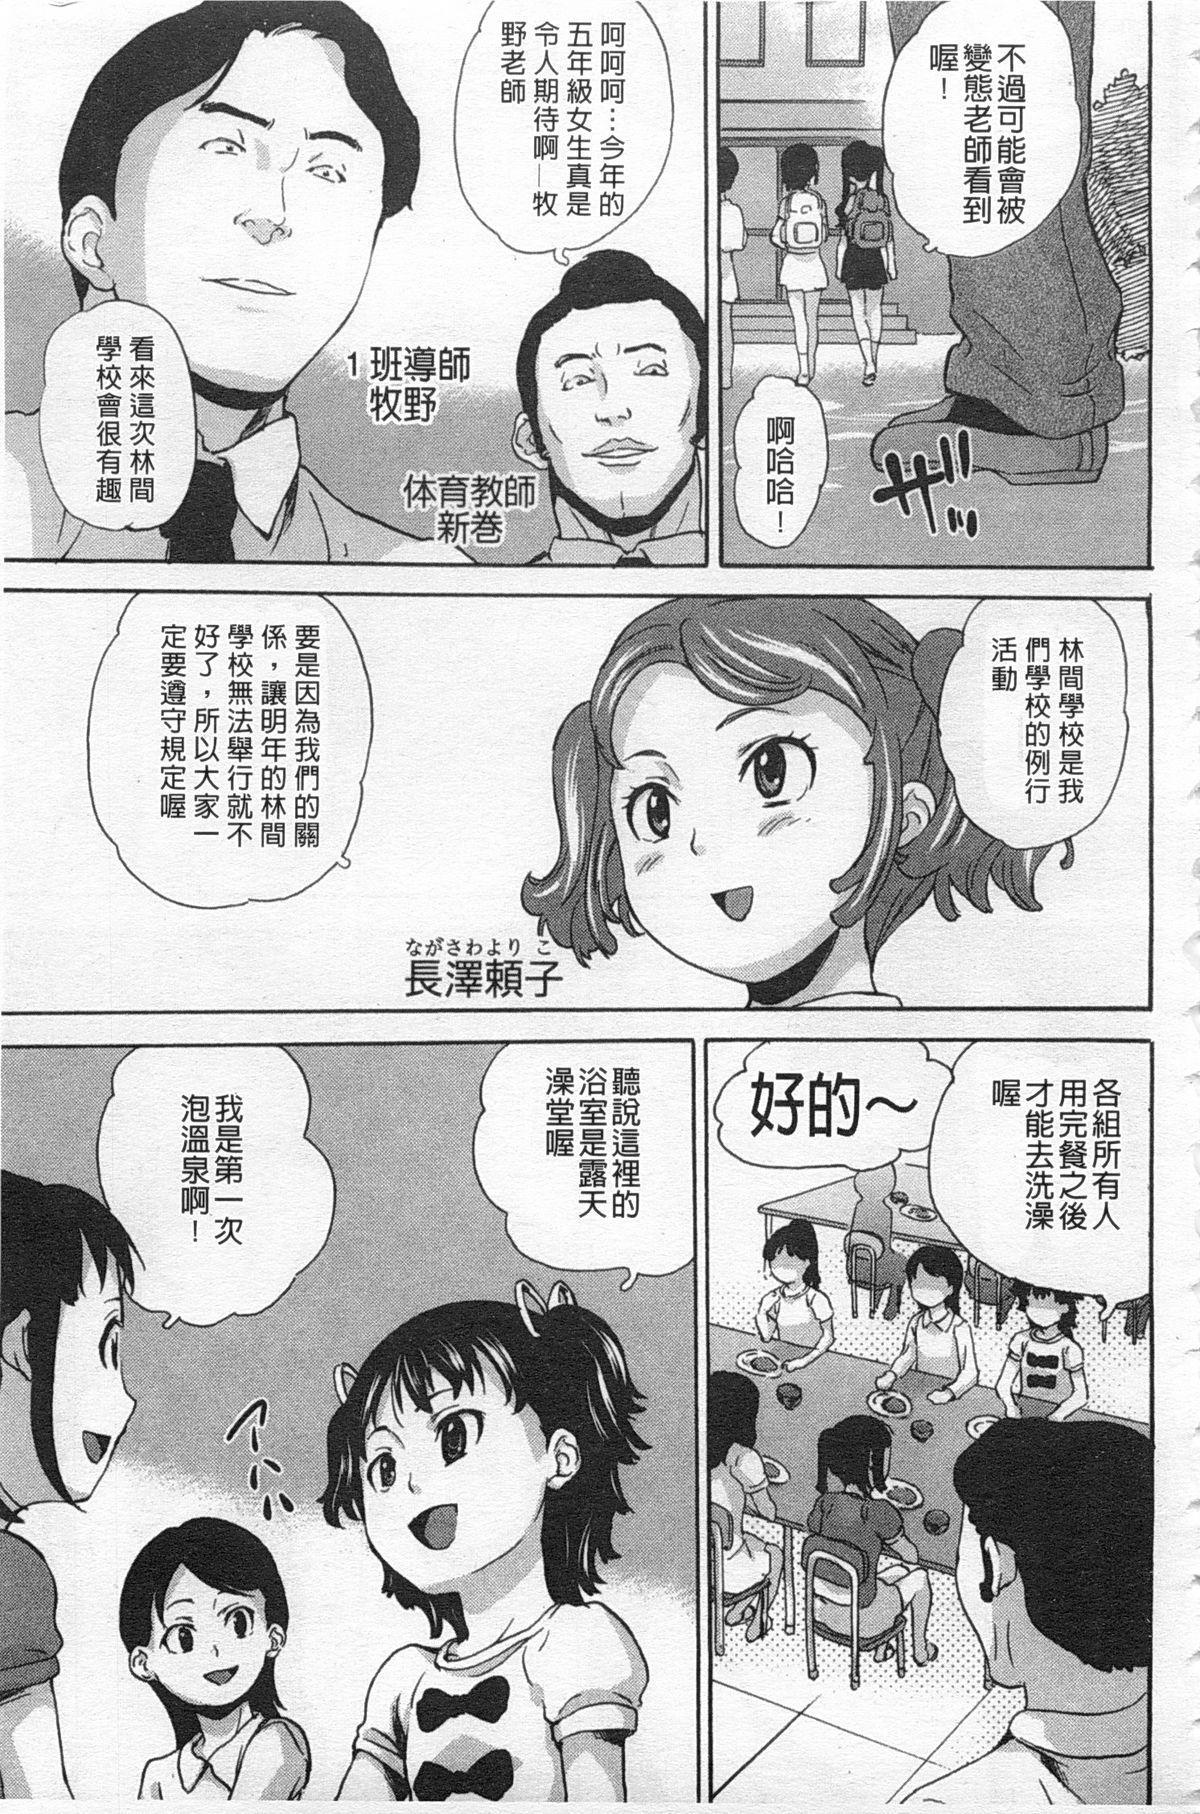 Zetsubou Rinkan Gakkou 5